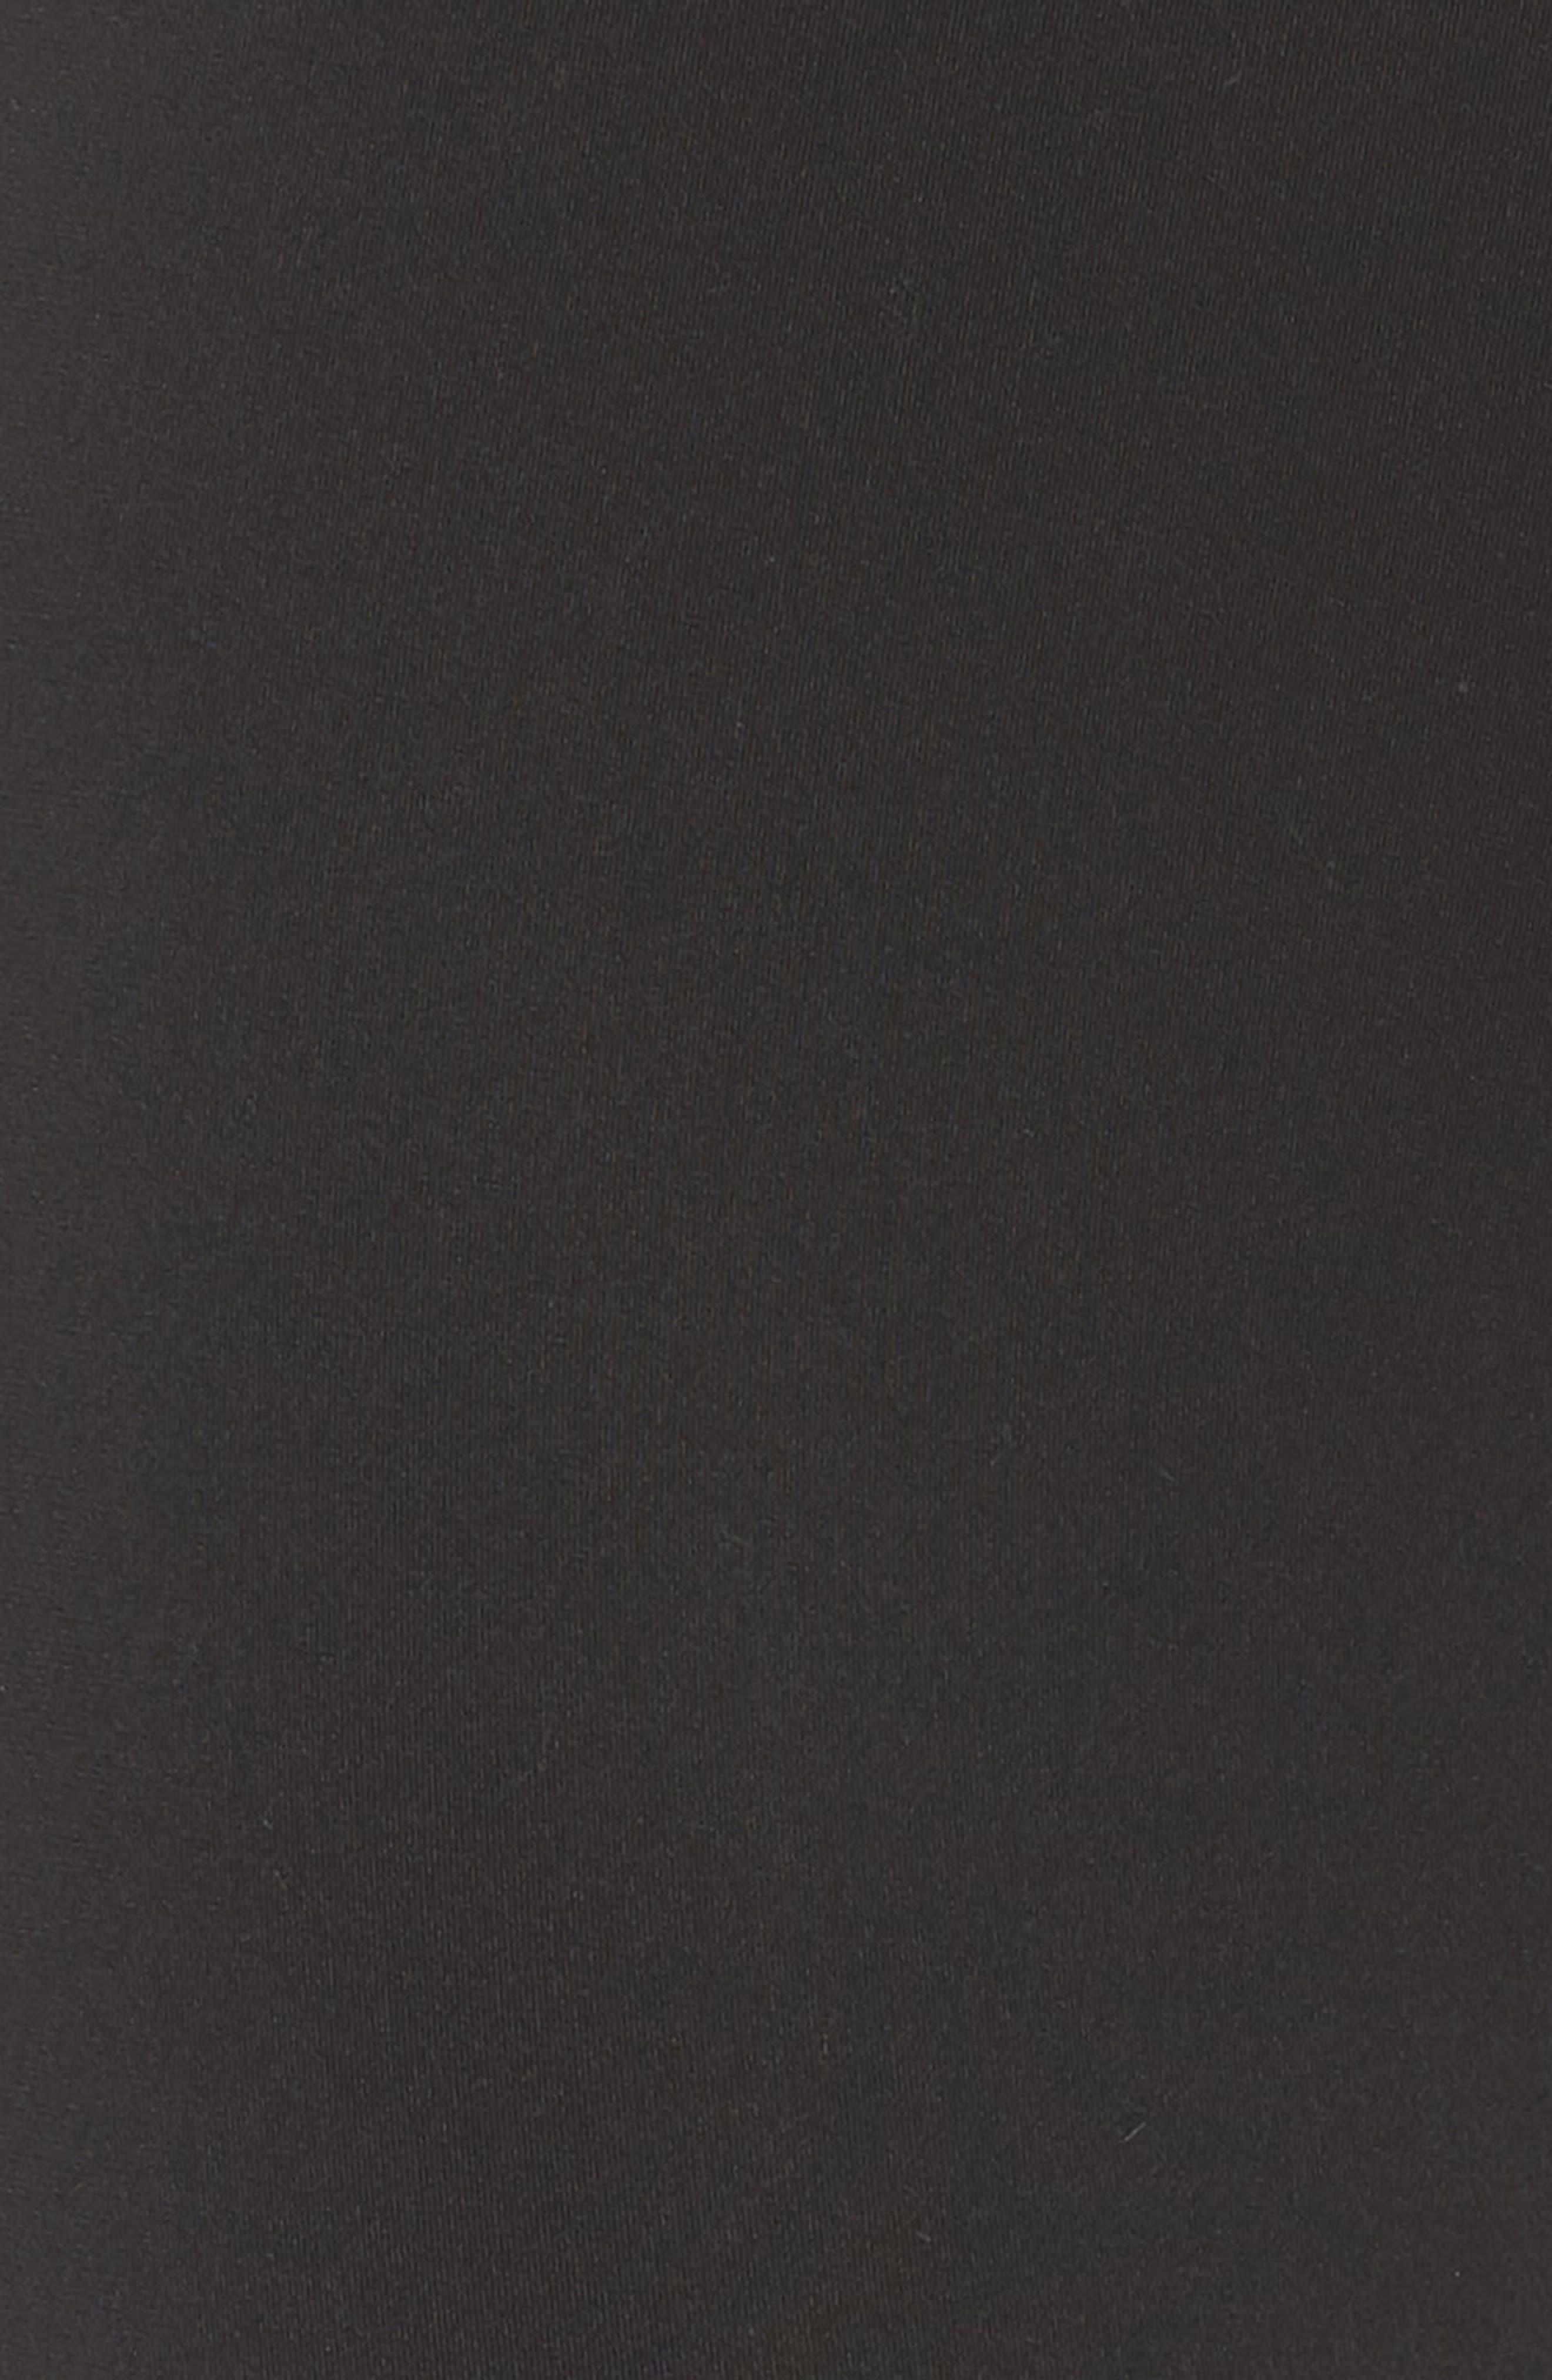 Trefoil Tights,                             Alternate thumbnail 6, color,                             BLACK